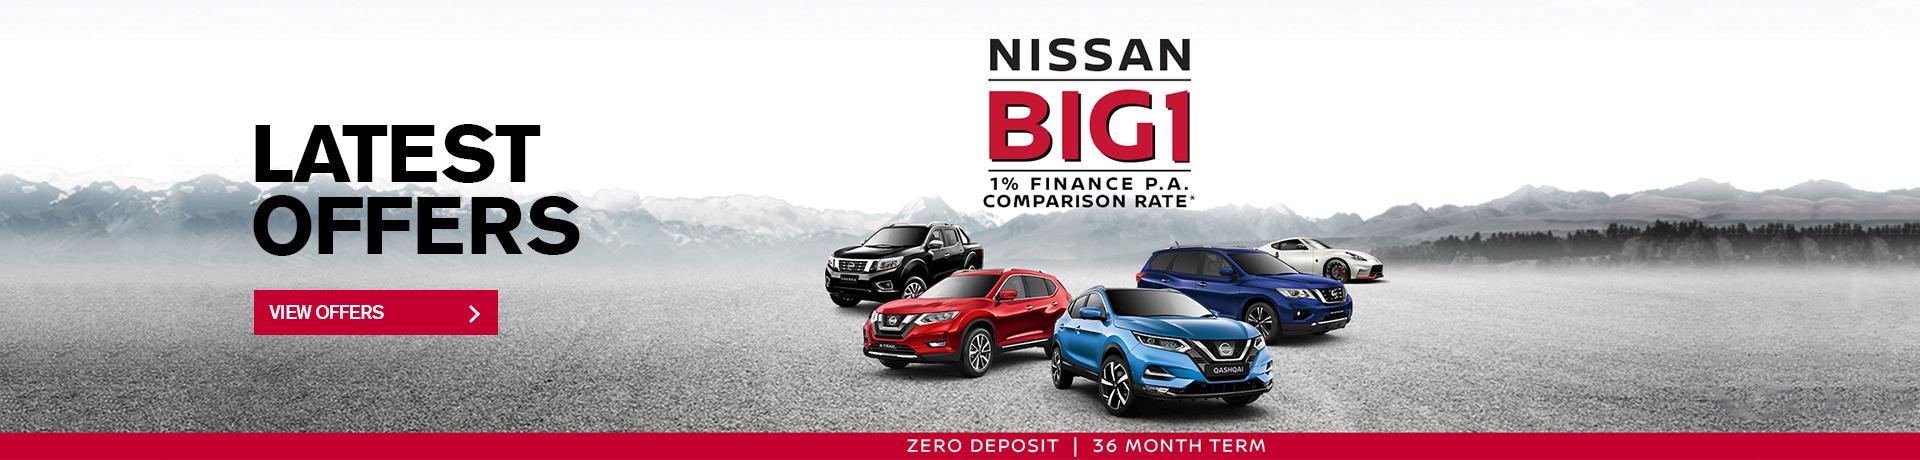 Nissan Big 1